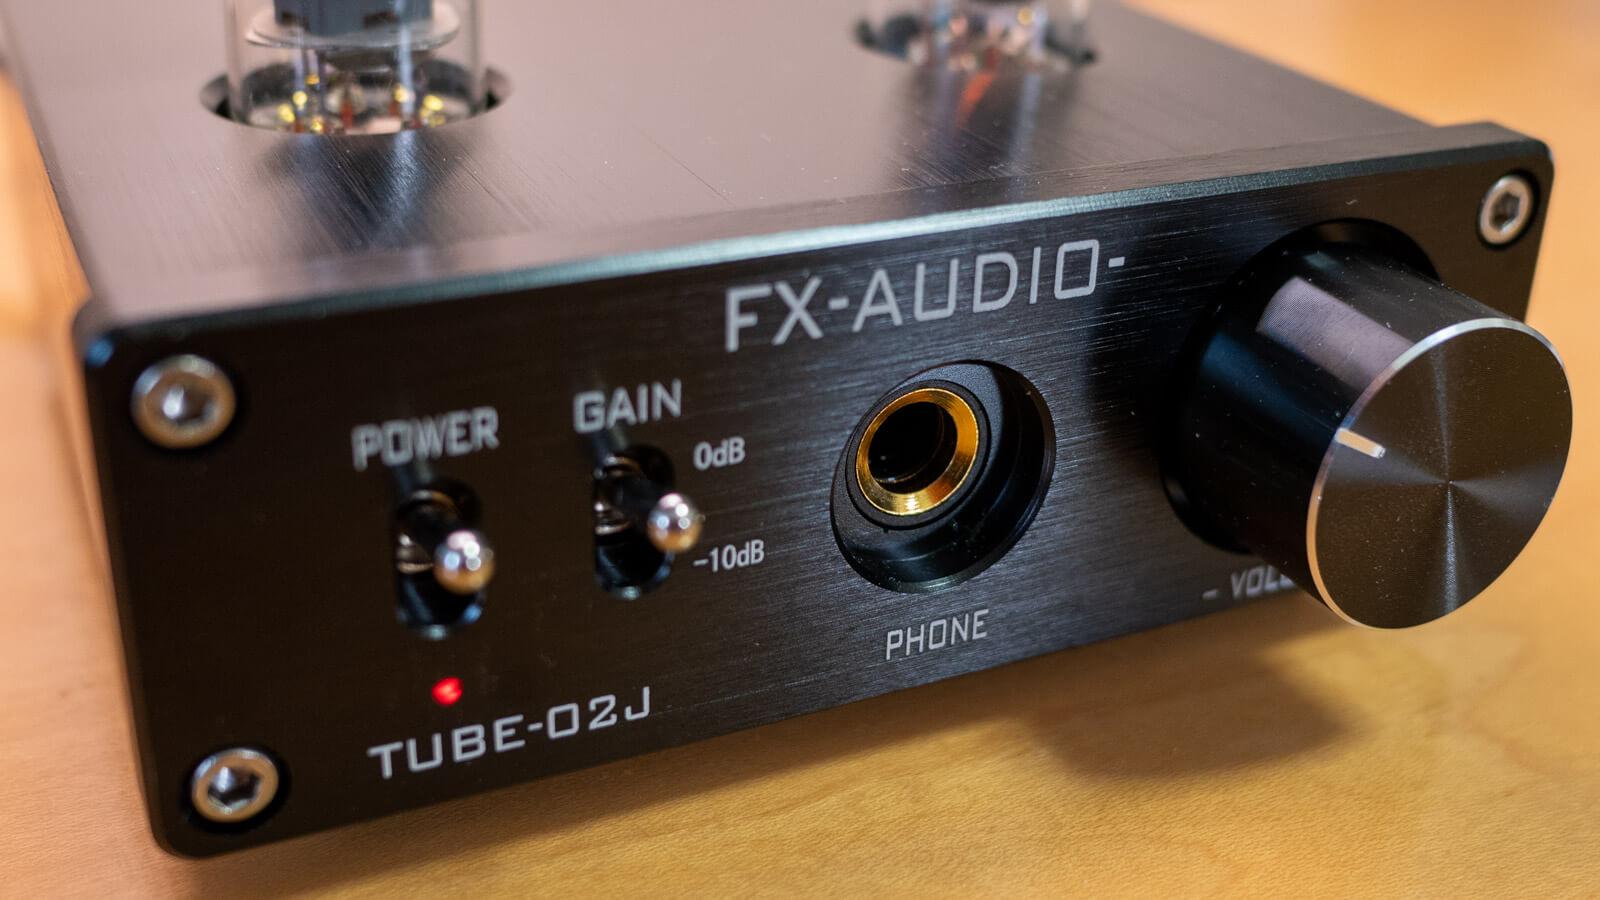 TUBE-02JのPHONE端子のアップ